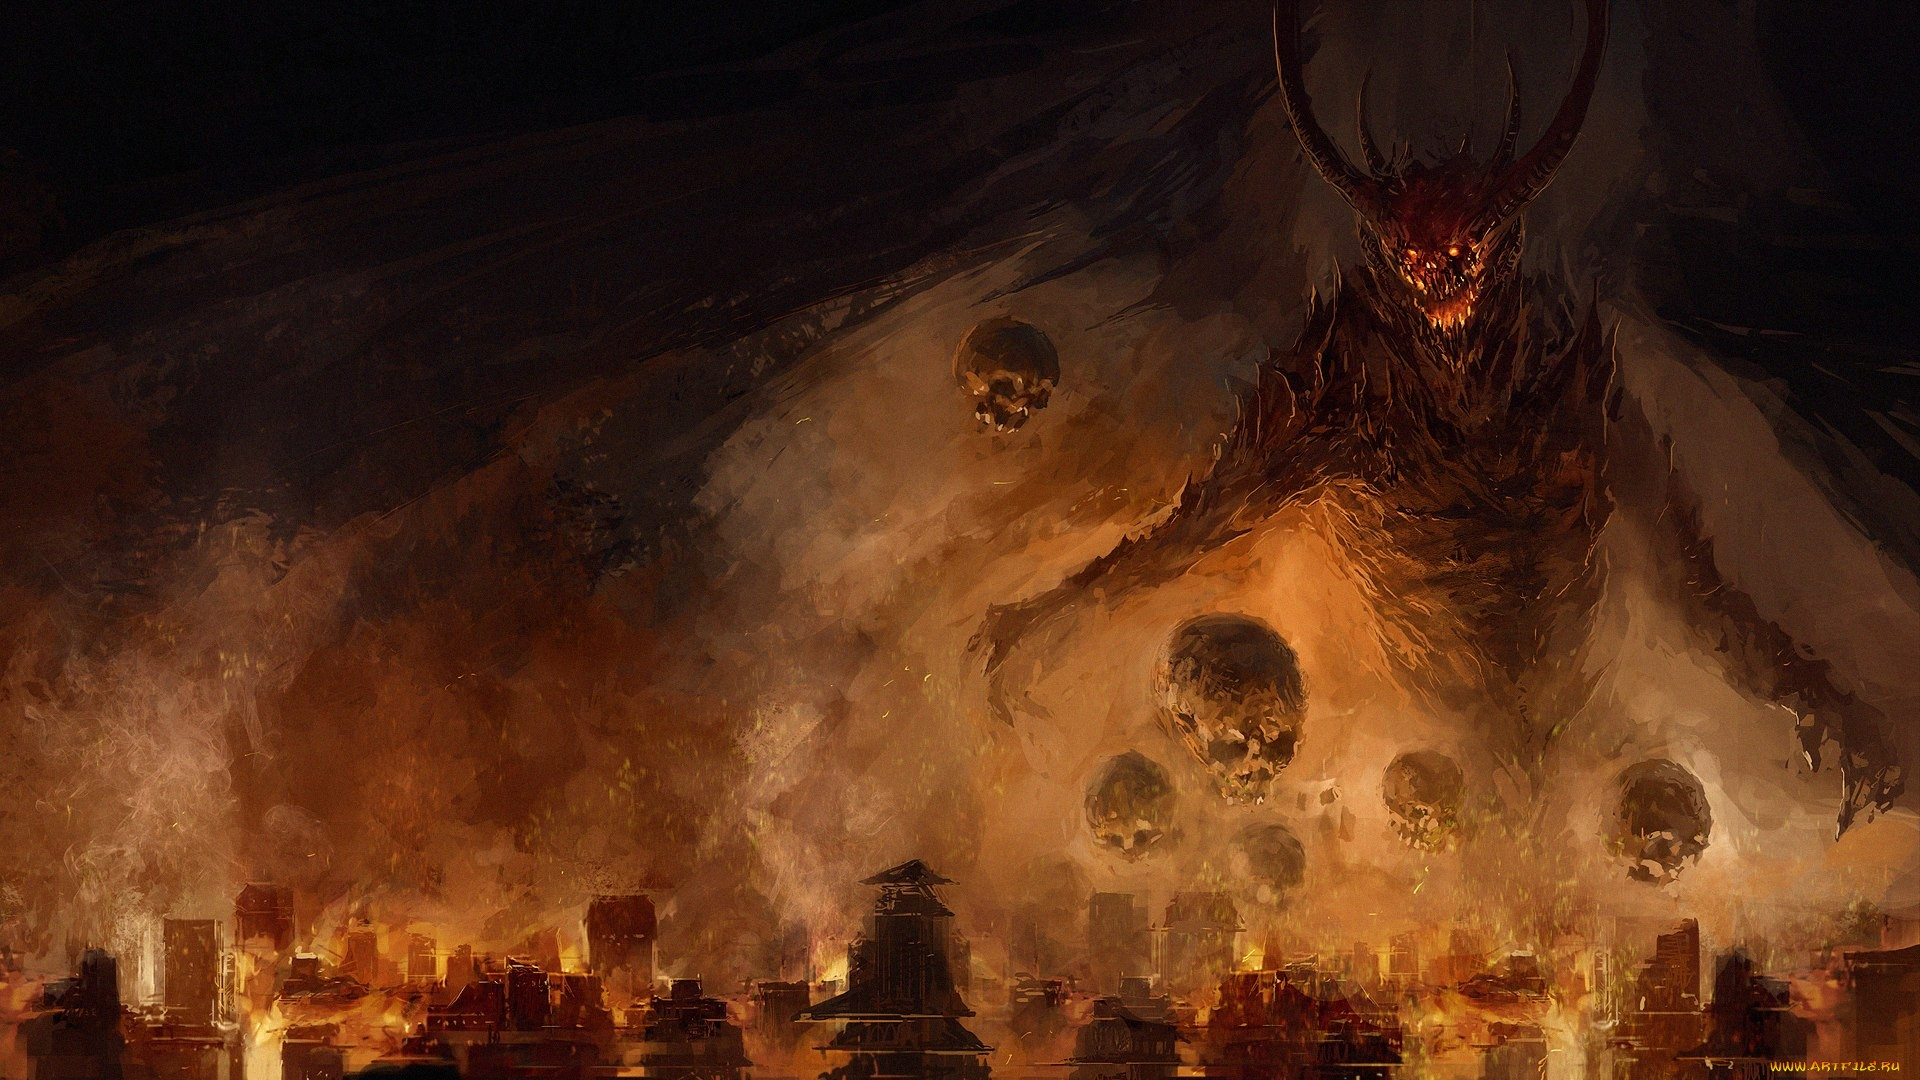 demon hd wallpapers 1920x1080 - photo #45